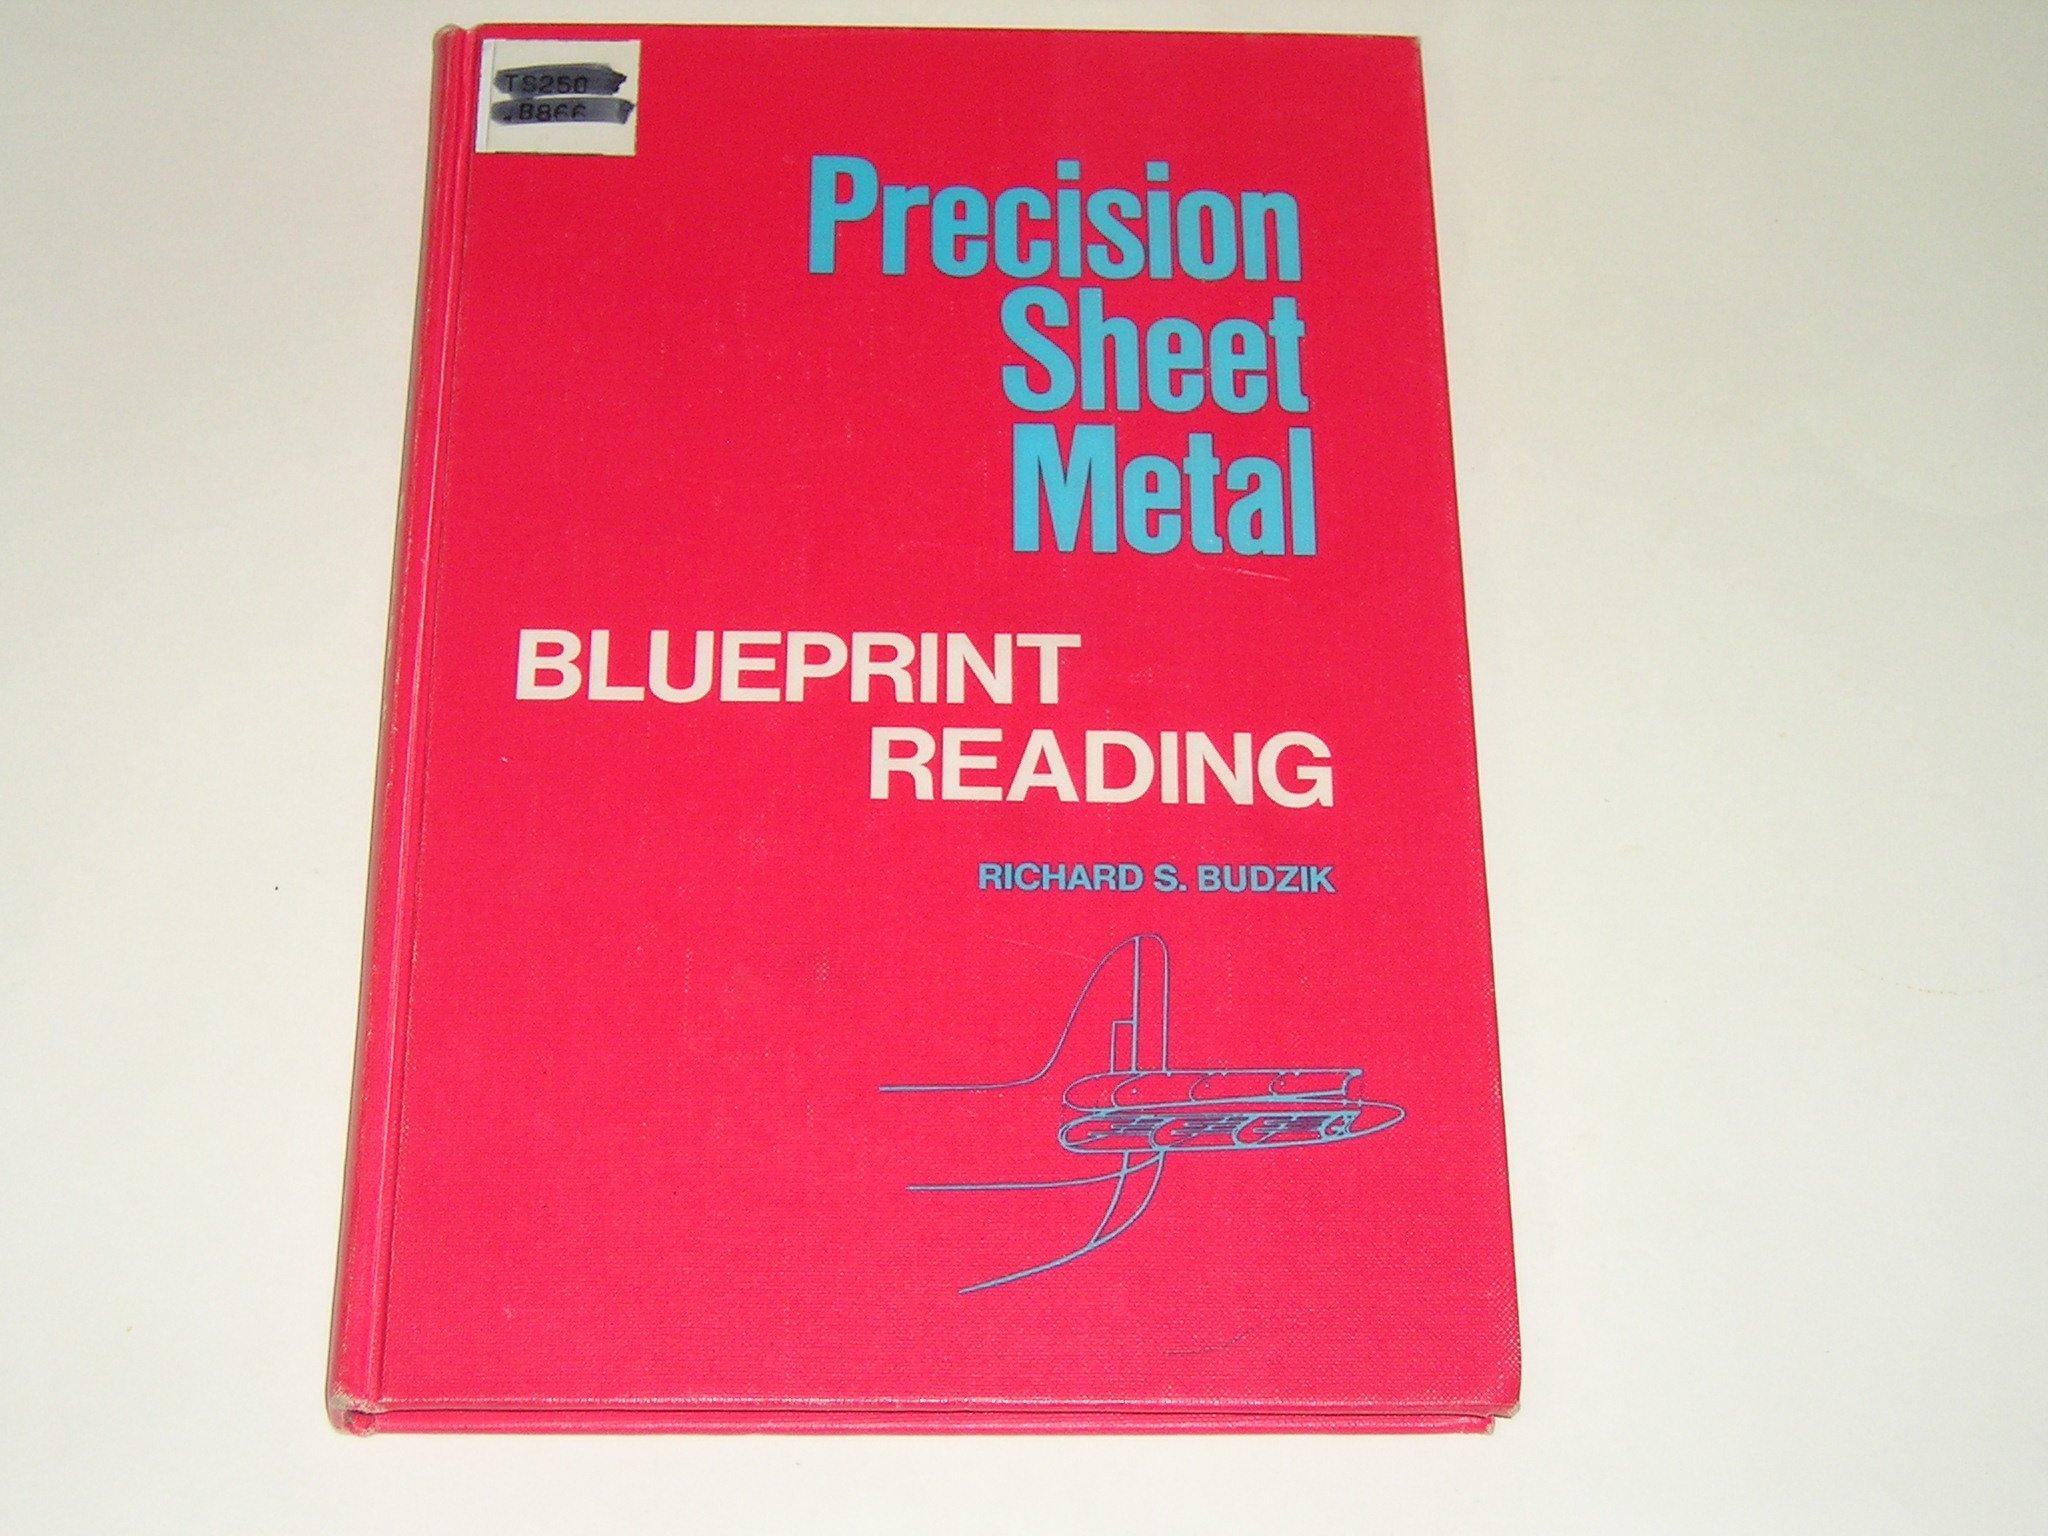 Precision sheet metal blueprint reading richard s budzik amazon precision sheet metal blueprint reading richard s budzik amazon books malvernweather Images